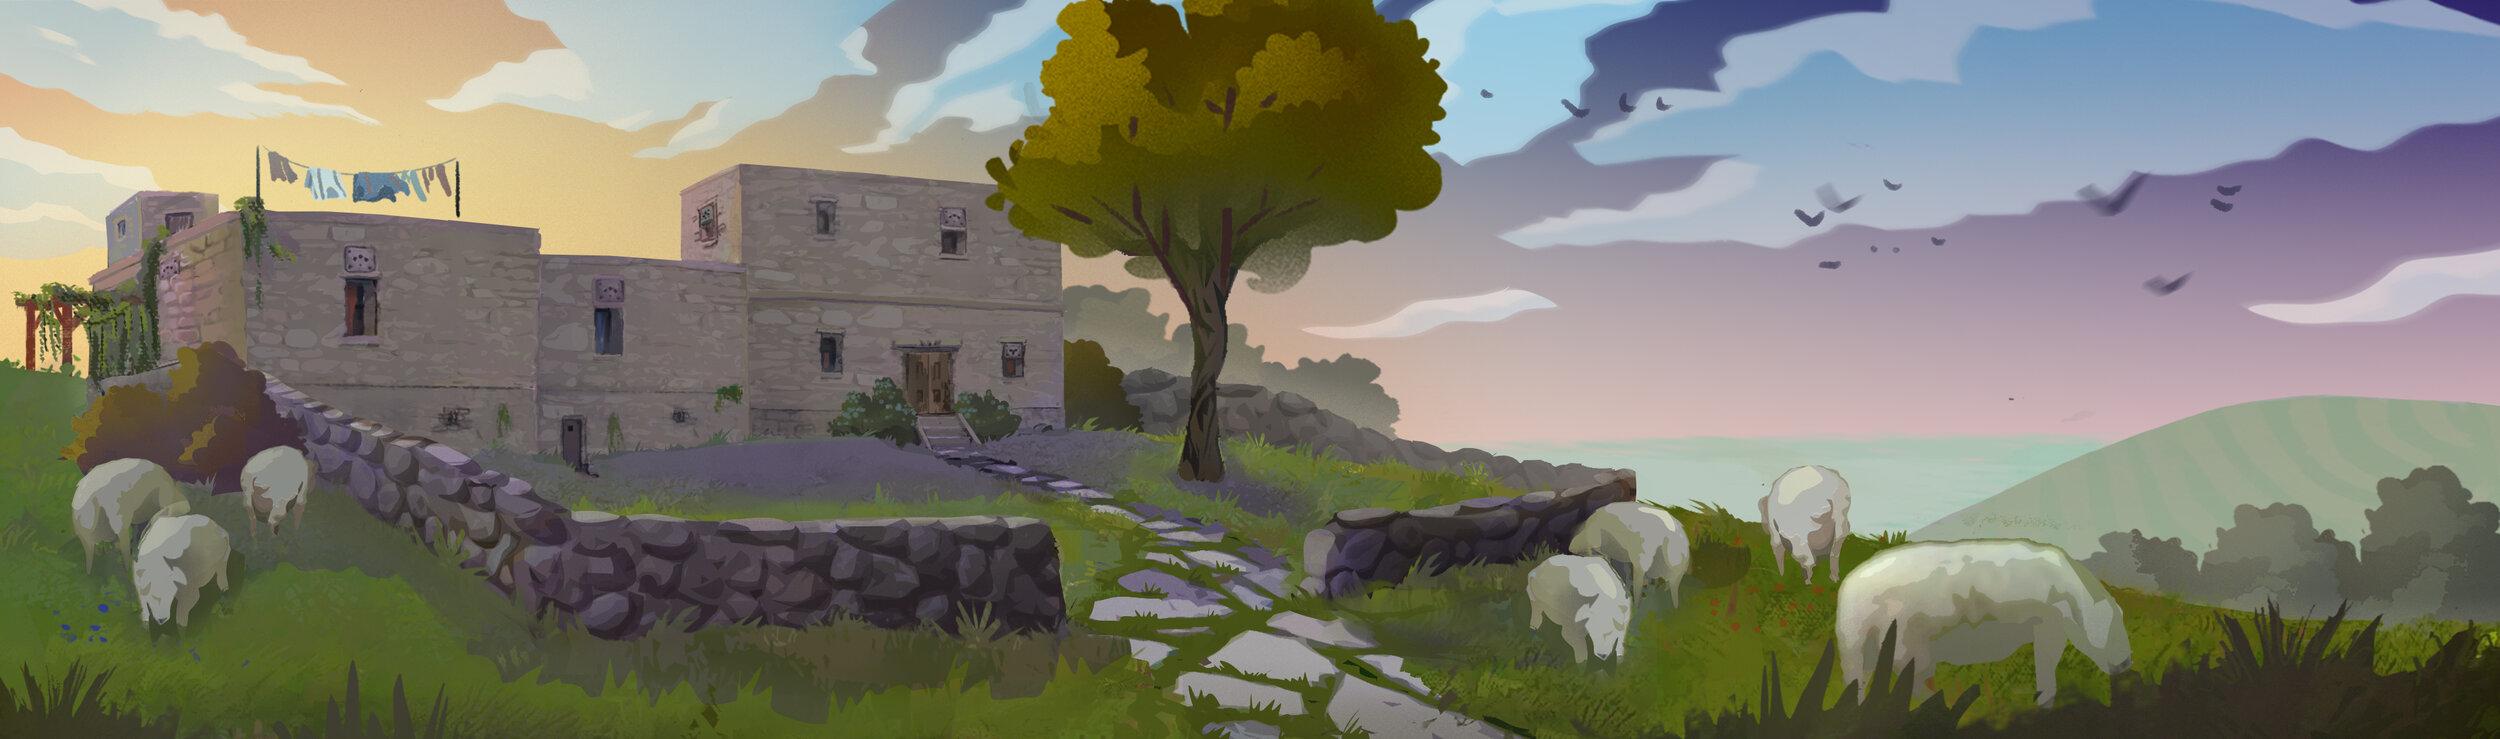 rich house_LAST2.jpg